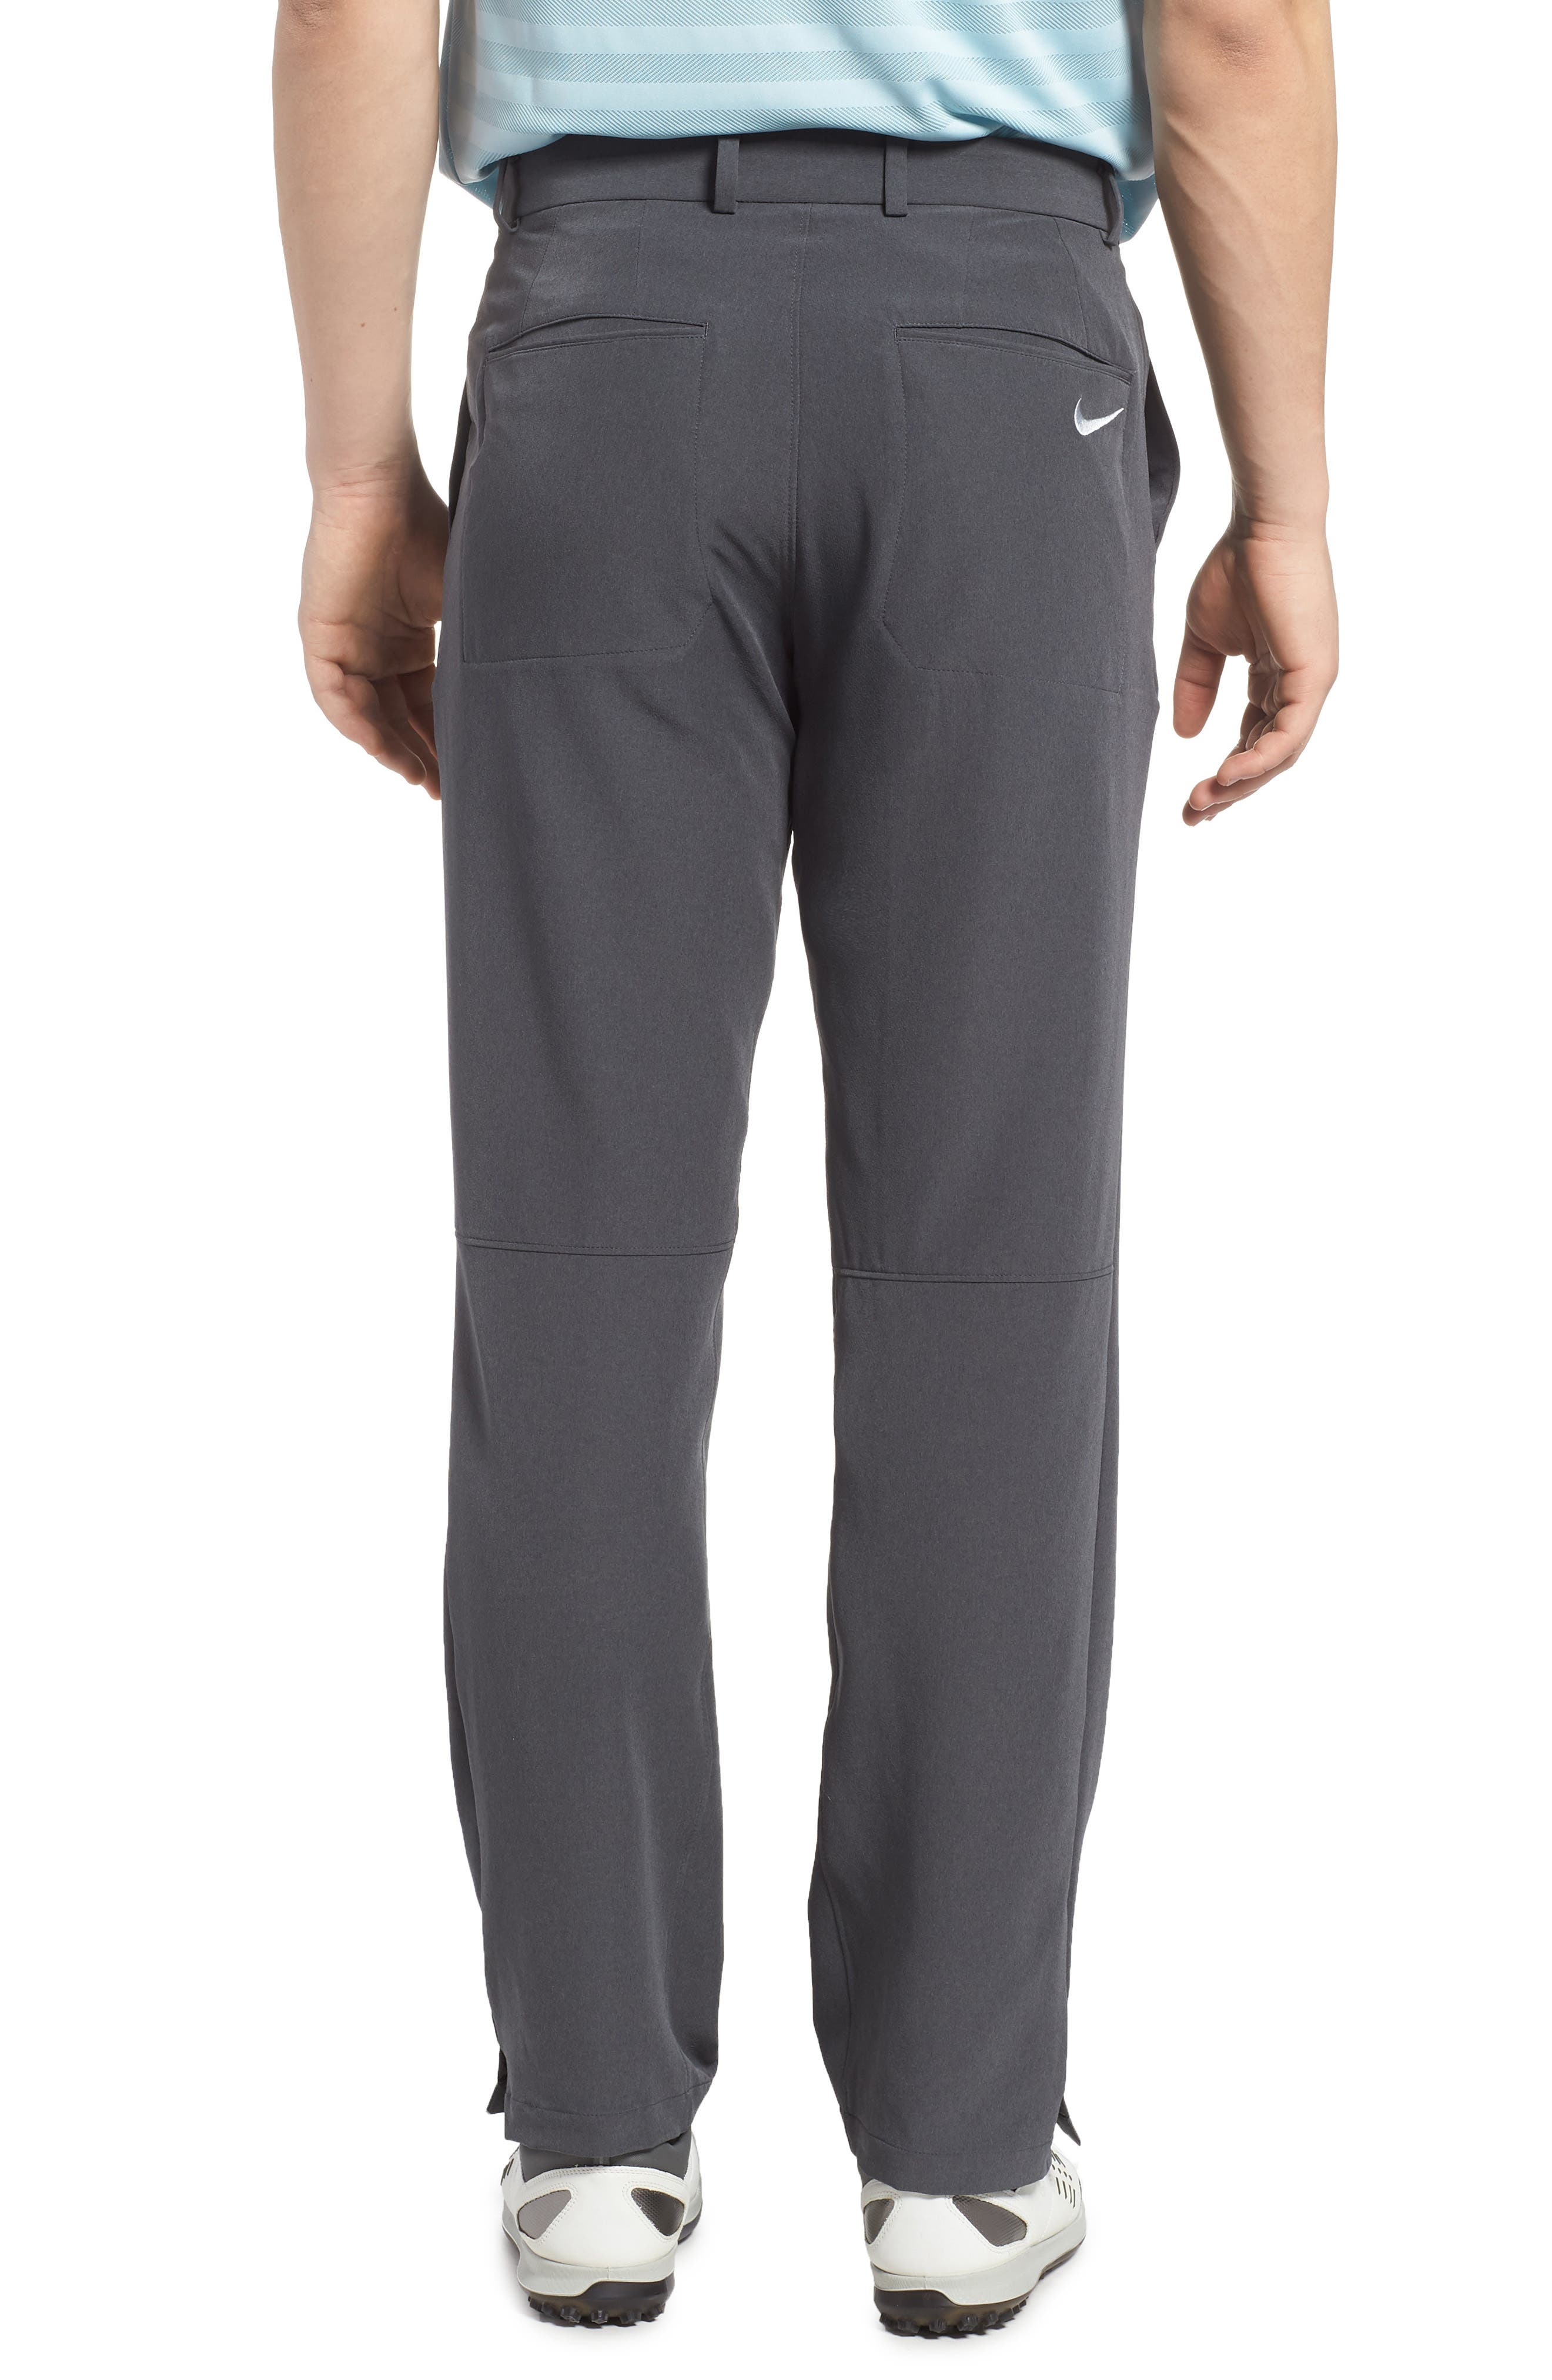 Hybrid Flex Golf Pants,                             Alternate thumbnail 2, color,                             CHARCOAL HEATHER/ DARK GREY